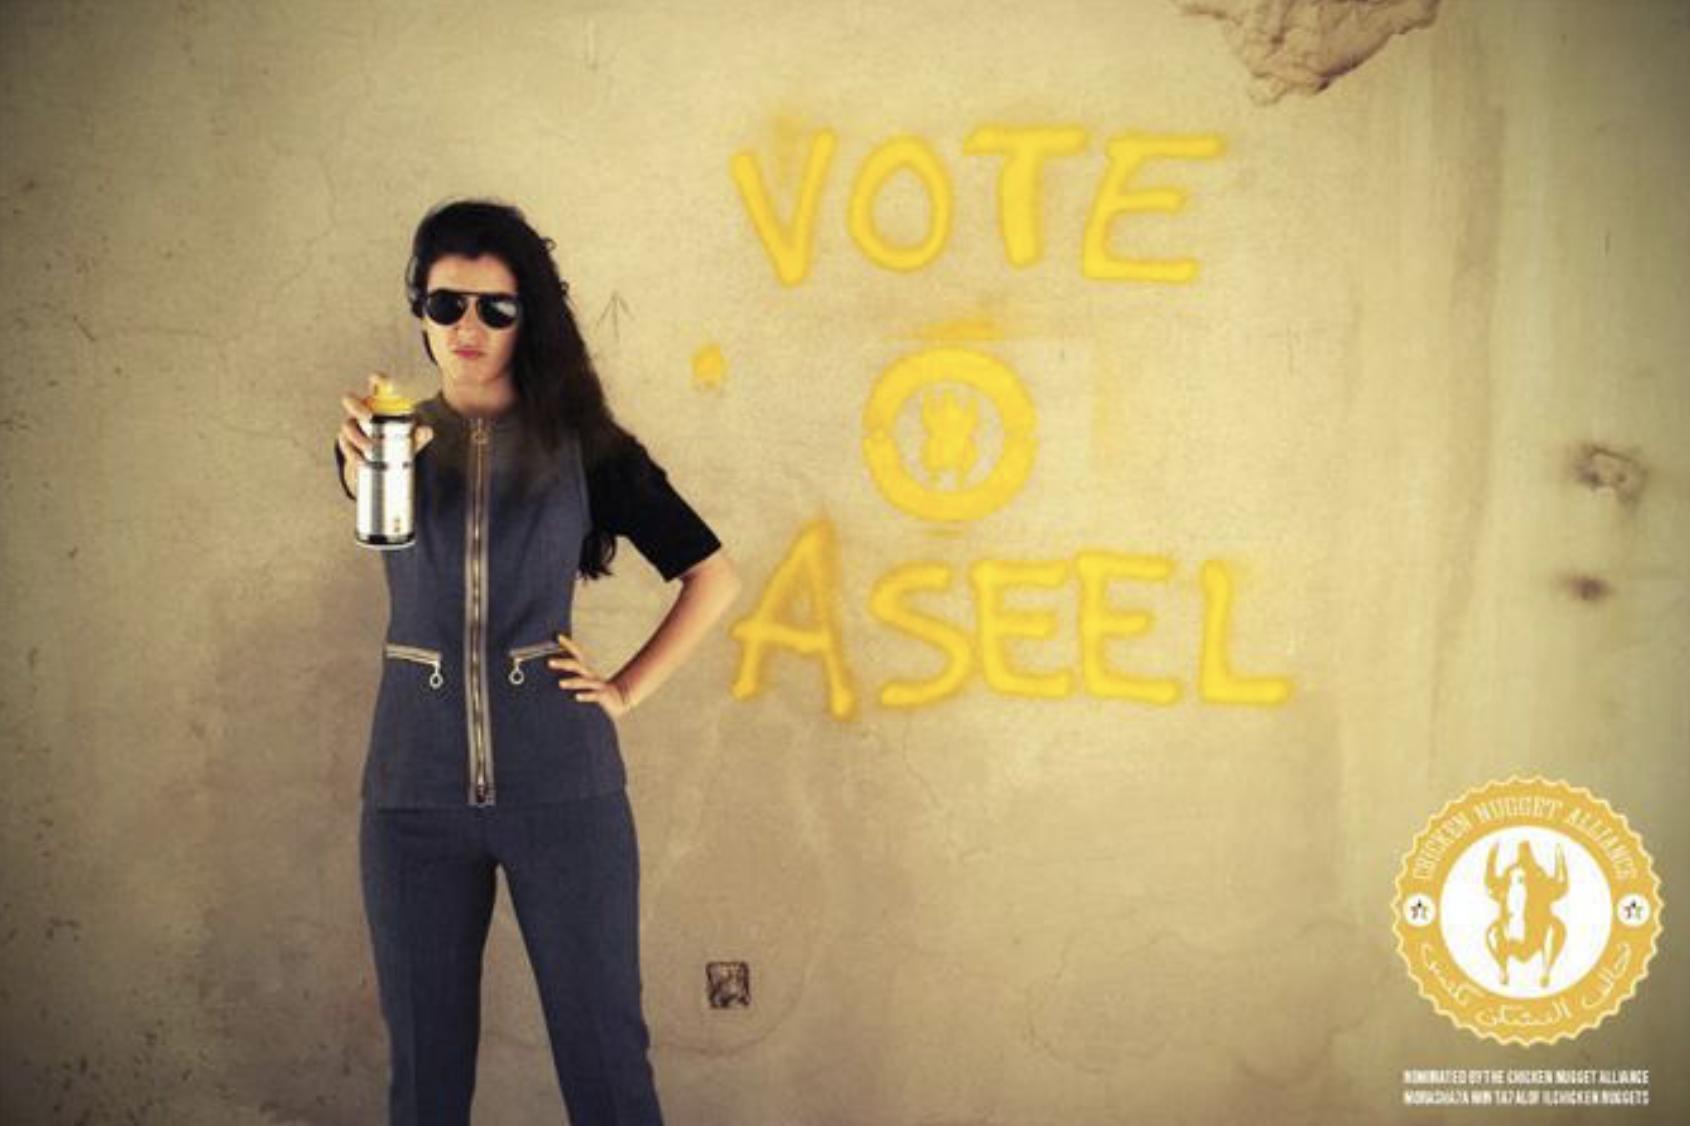 Aseel Al Yaqoub. 2014. Photograph. Courtesy of bazaar.town. 2018